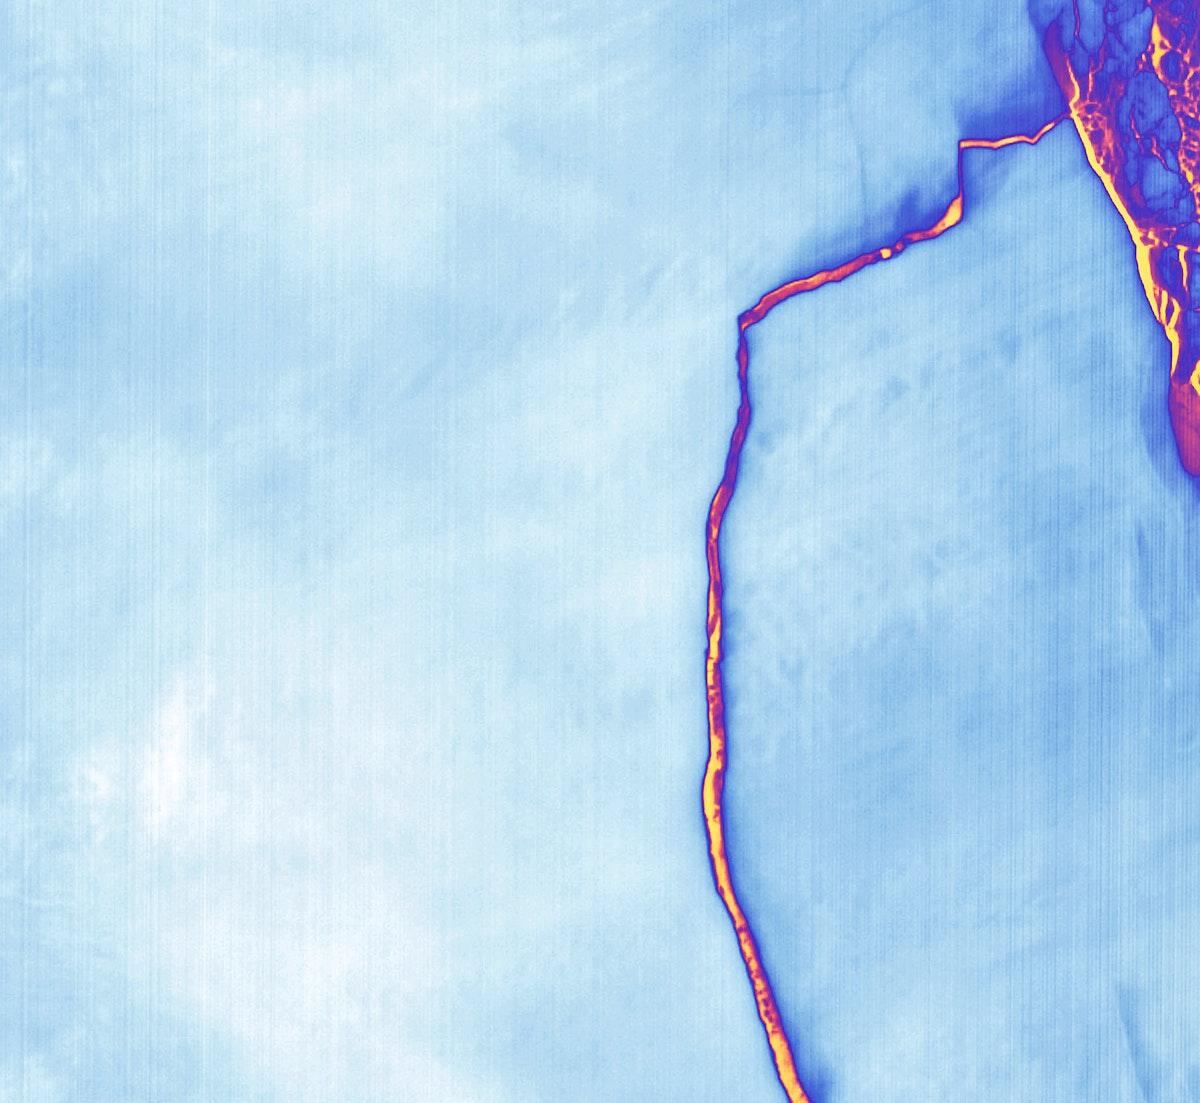 Massive Iceberg Breaks Off from Antarctica. Original from NASA. Digitally enhanced by rawpixel.